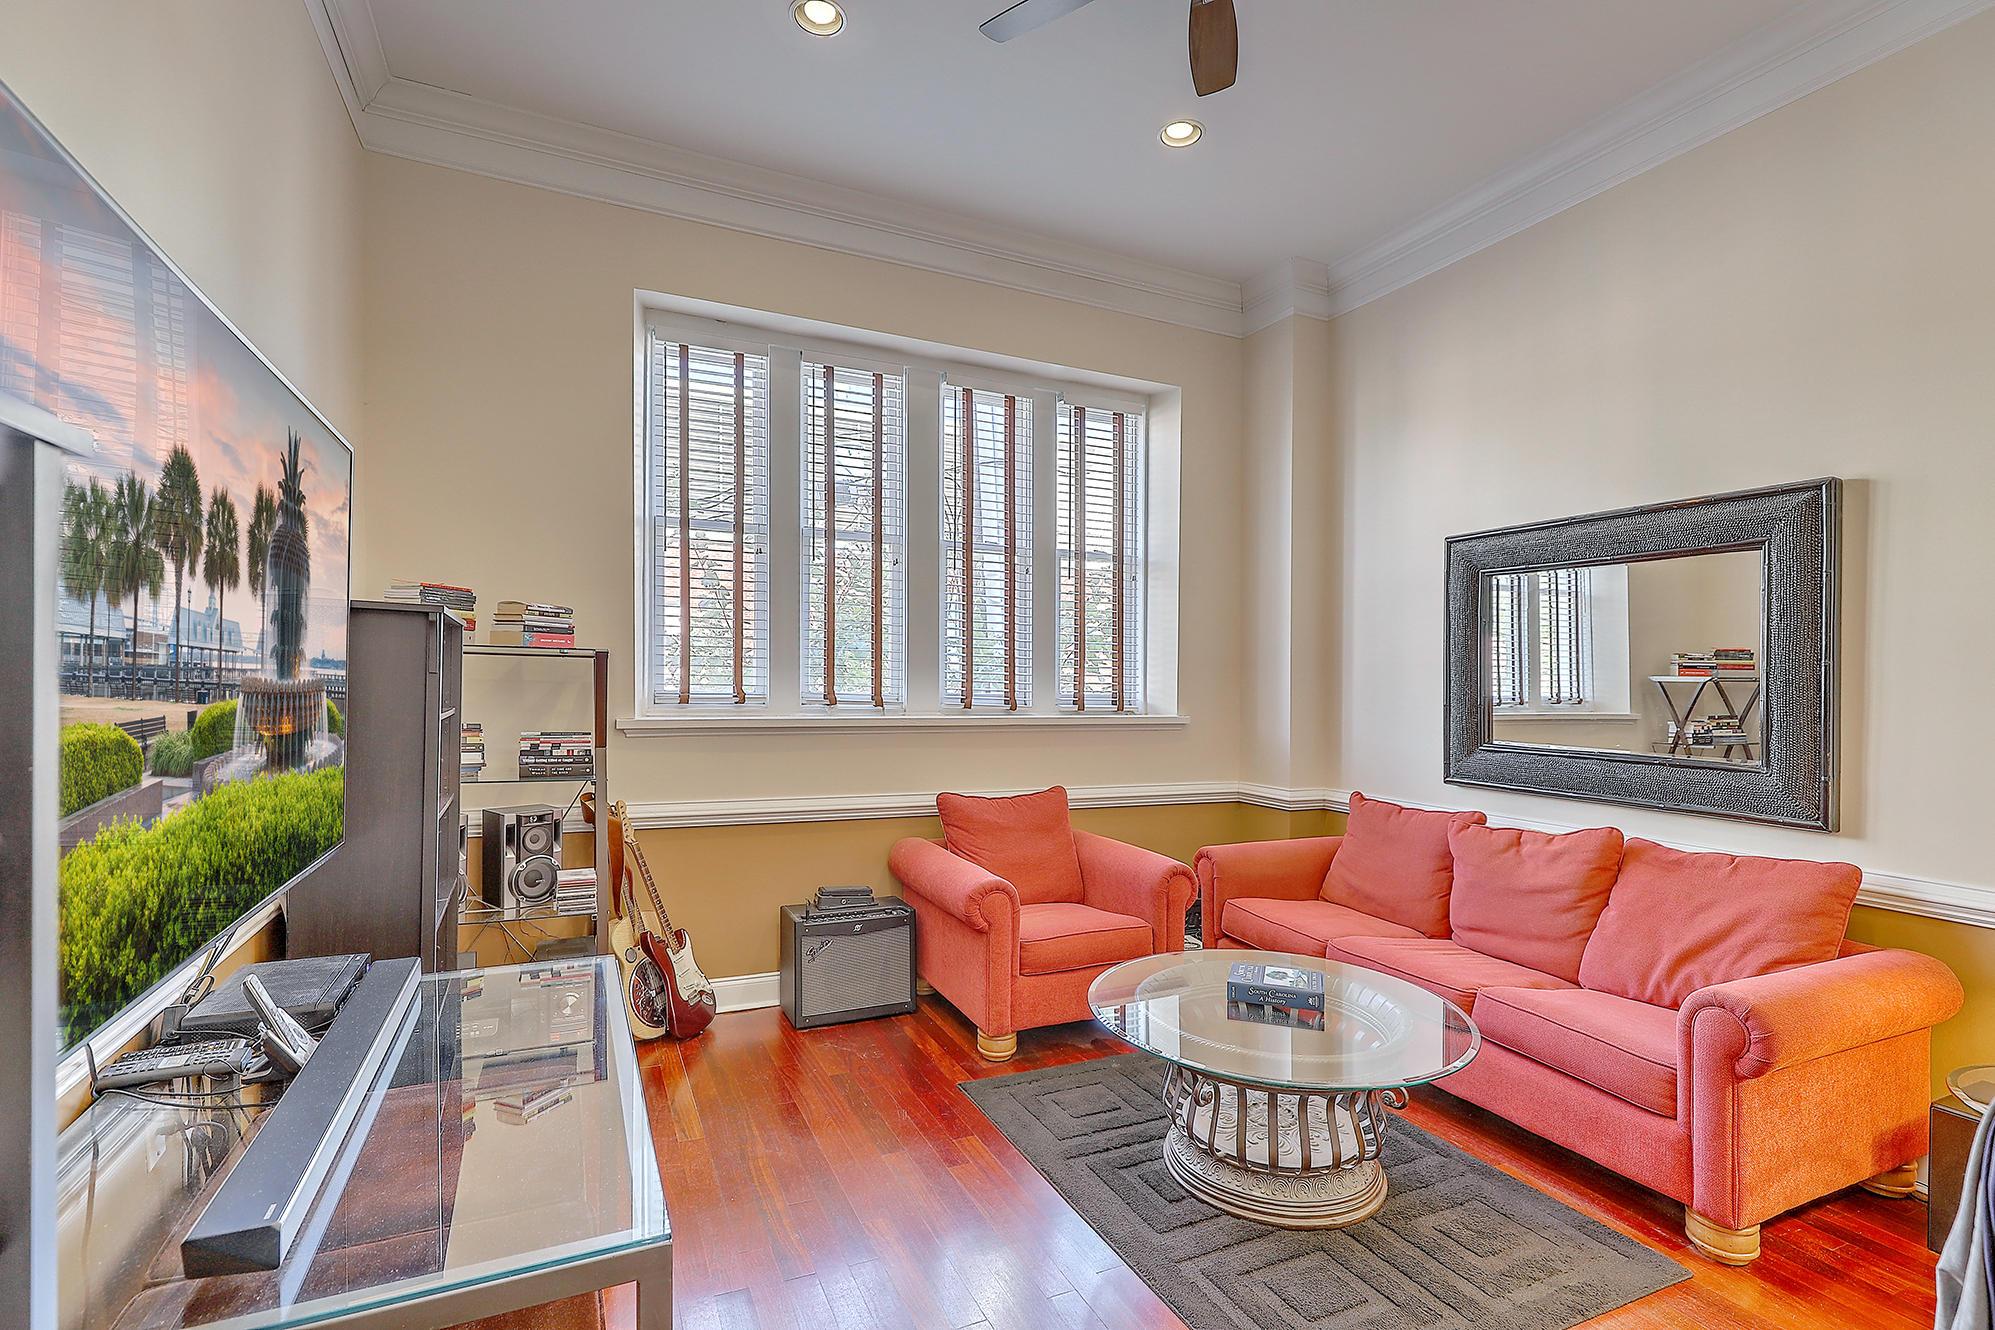 King Street Lofts Homes For Sale - 350 King, Charleston, SC - 8